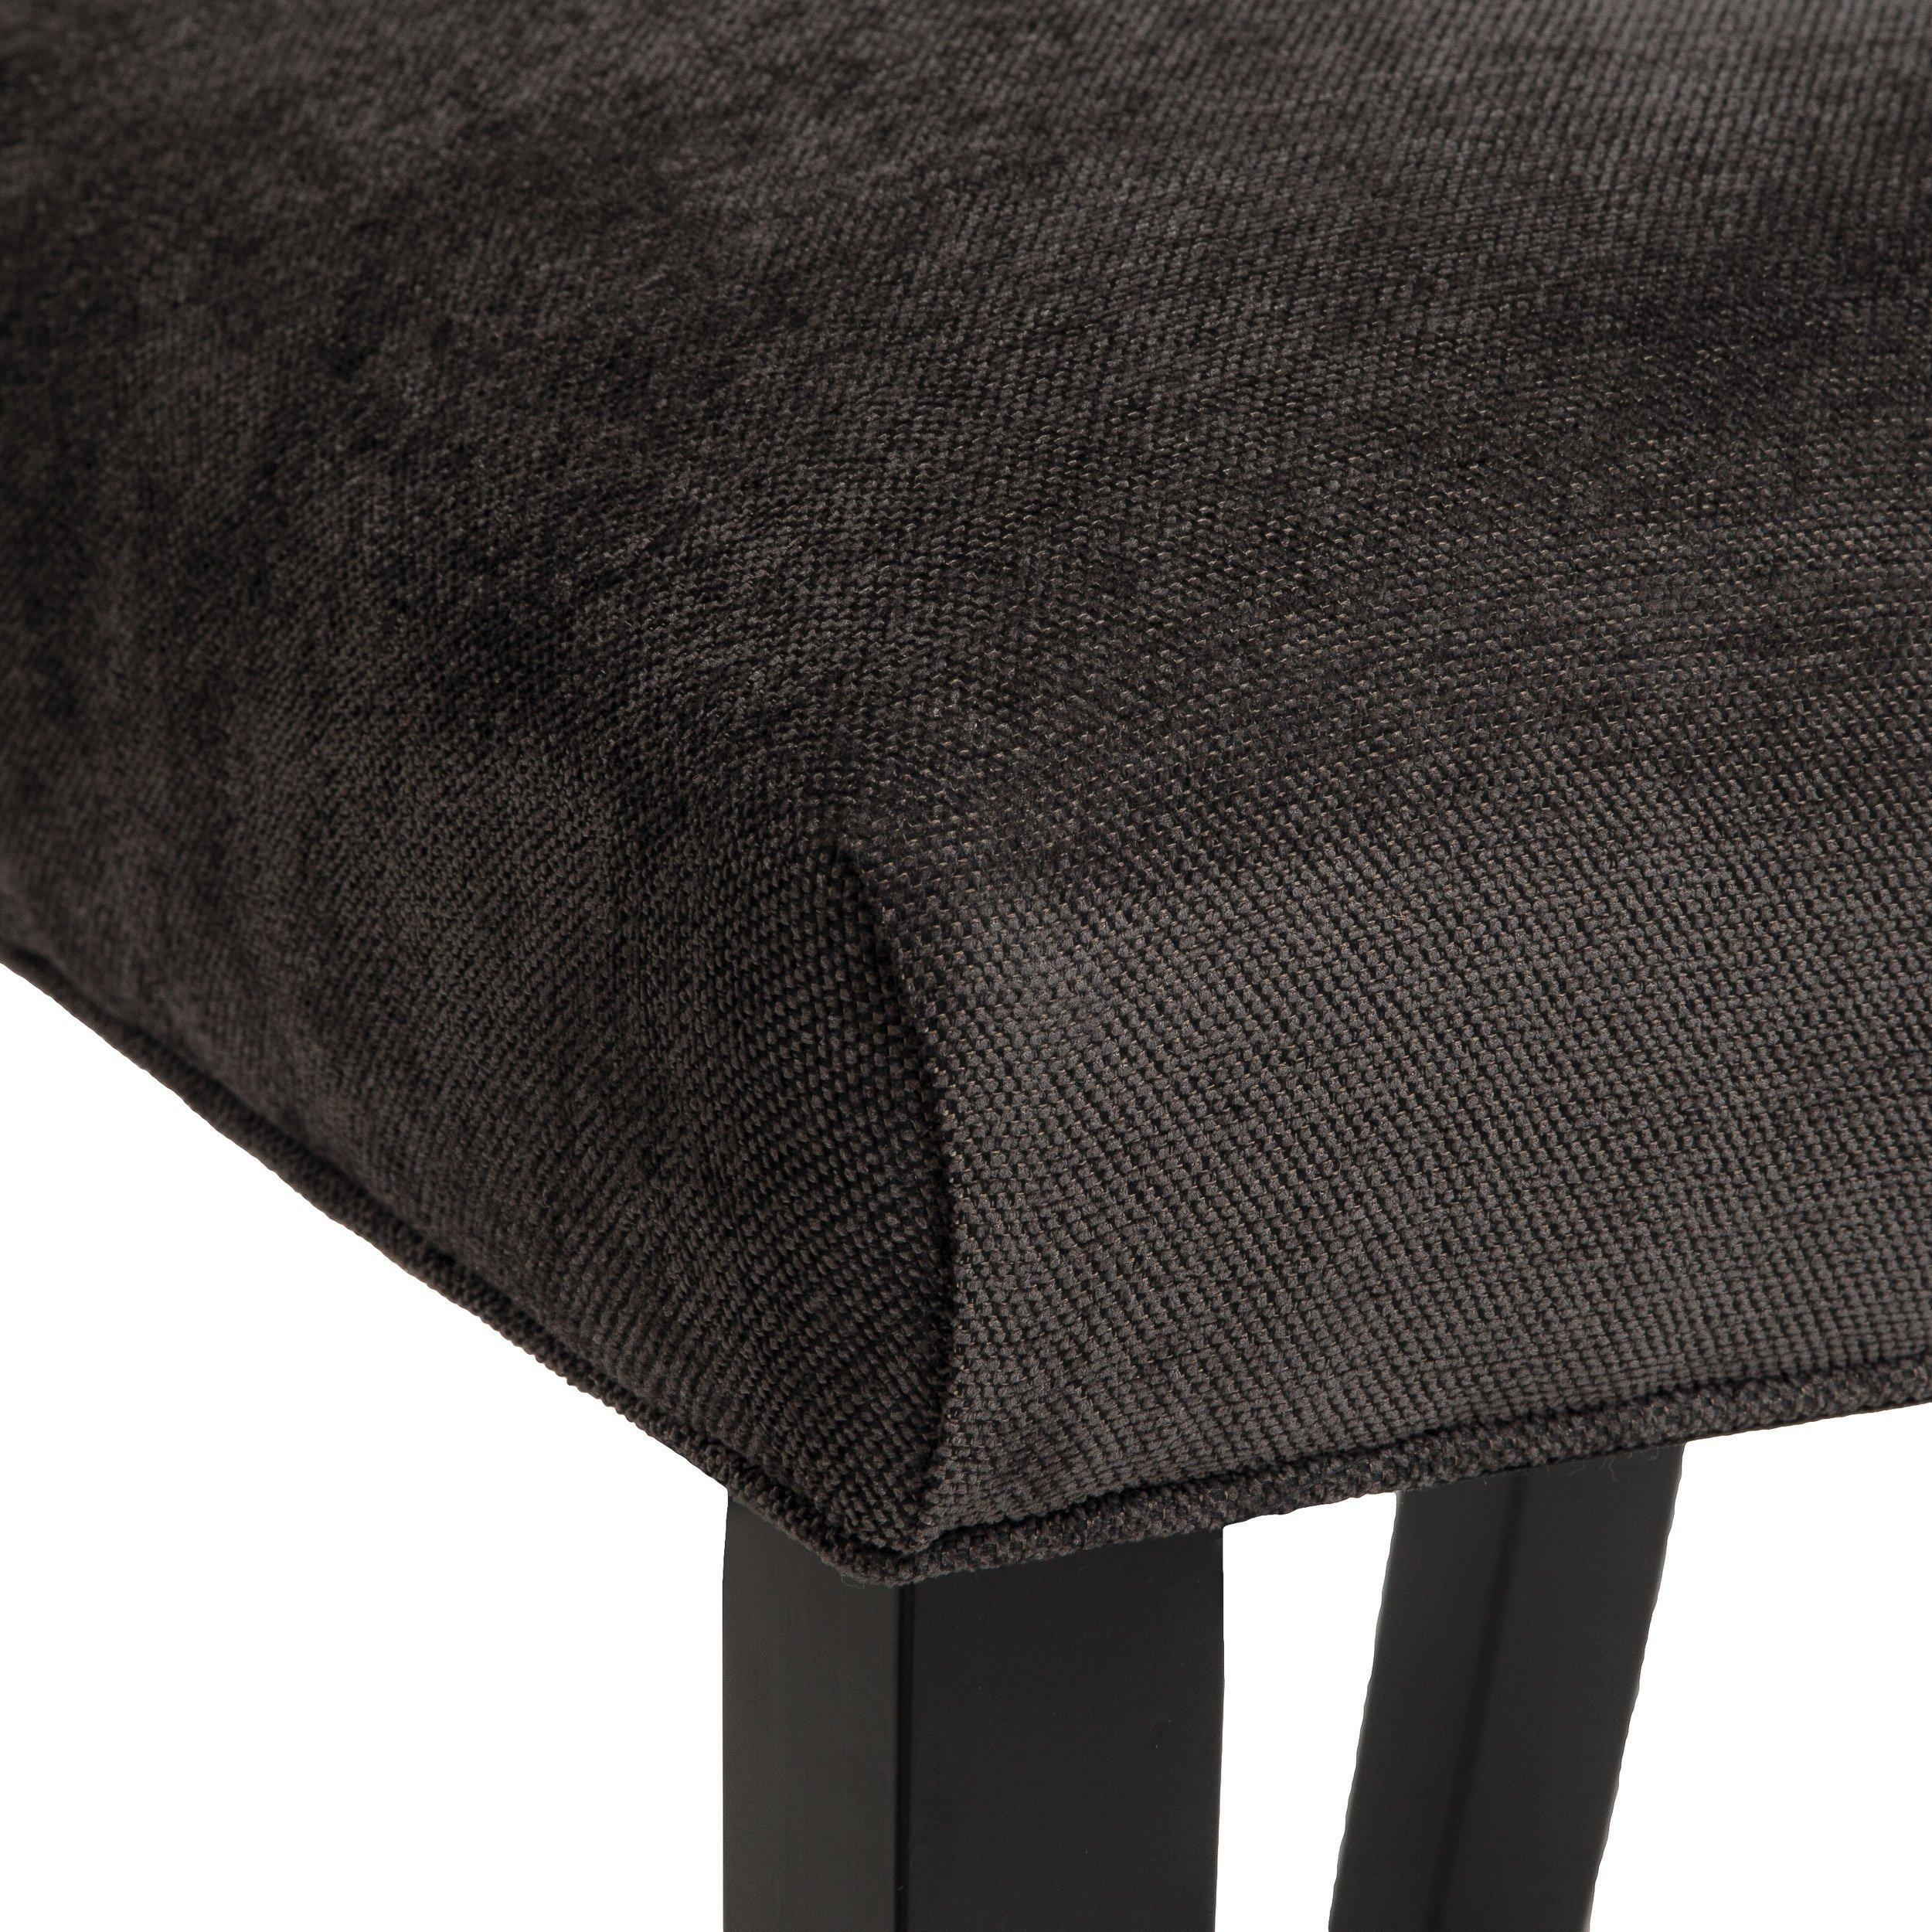 Clark Dark Grey Fabric Tufted Dining Chairs Set of 2